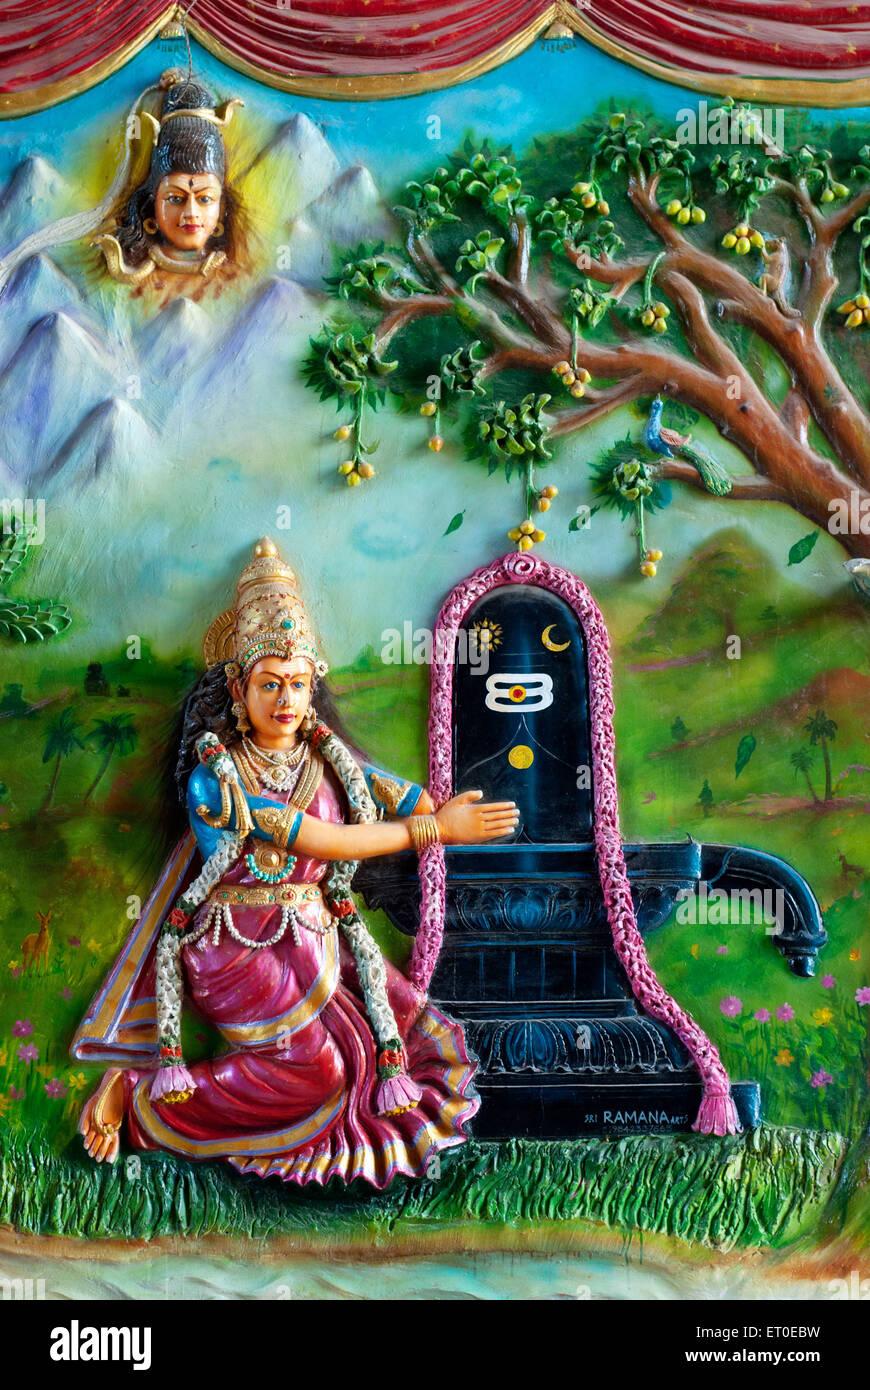 Stucco work of Parvathi worshipping Lord Shiva in Sri Ekambaranathar Temples  ; kanchipuram  ; kancheepuram - Stock Image